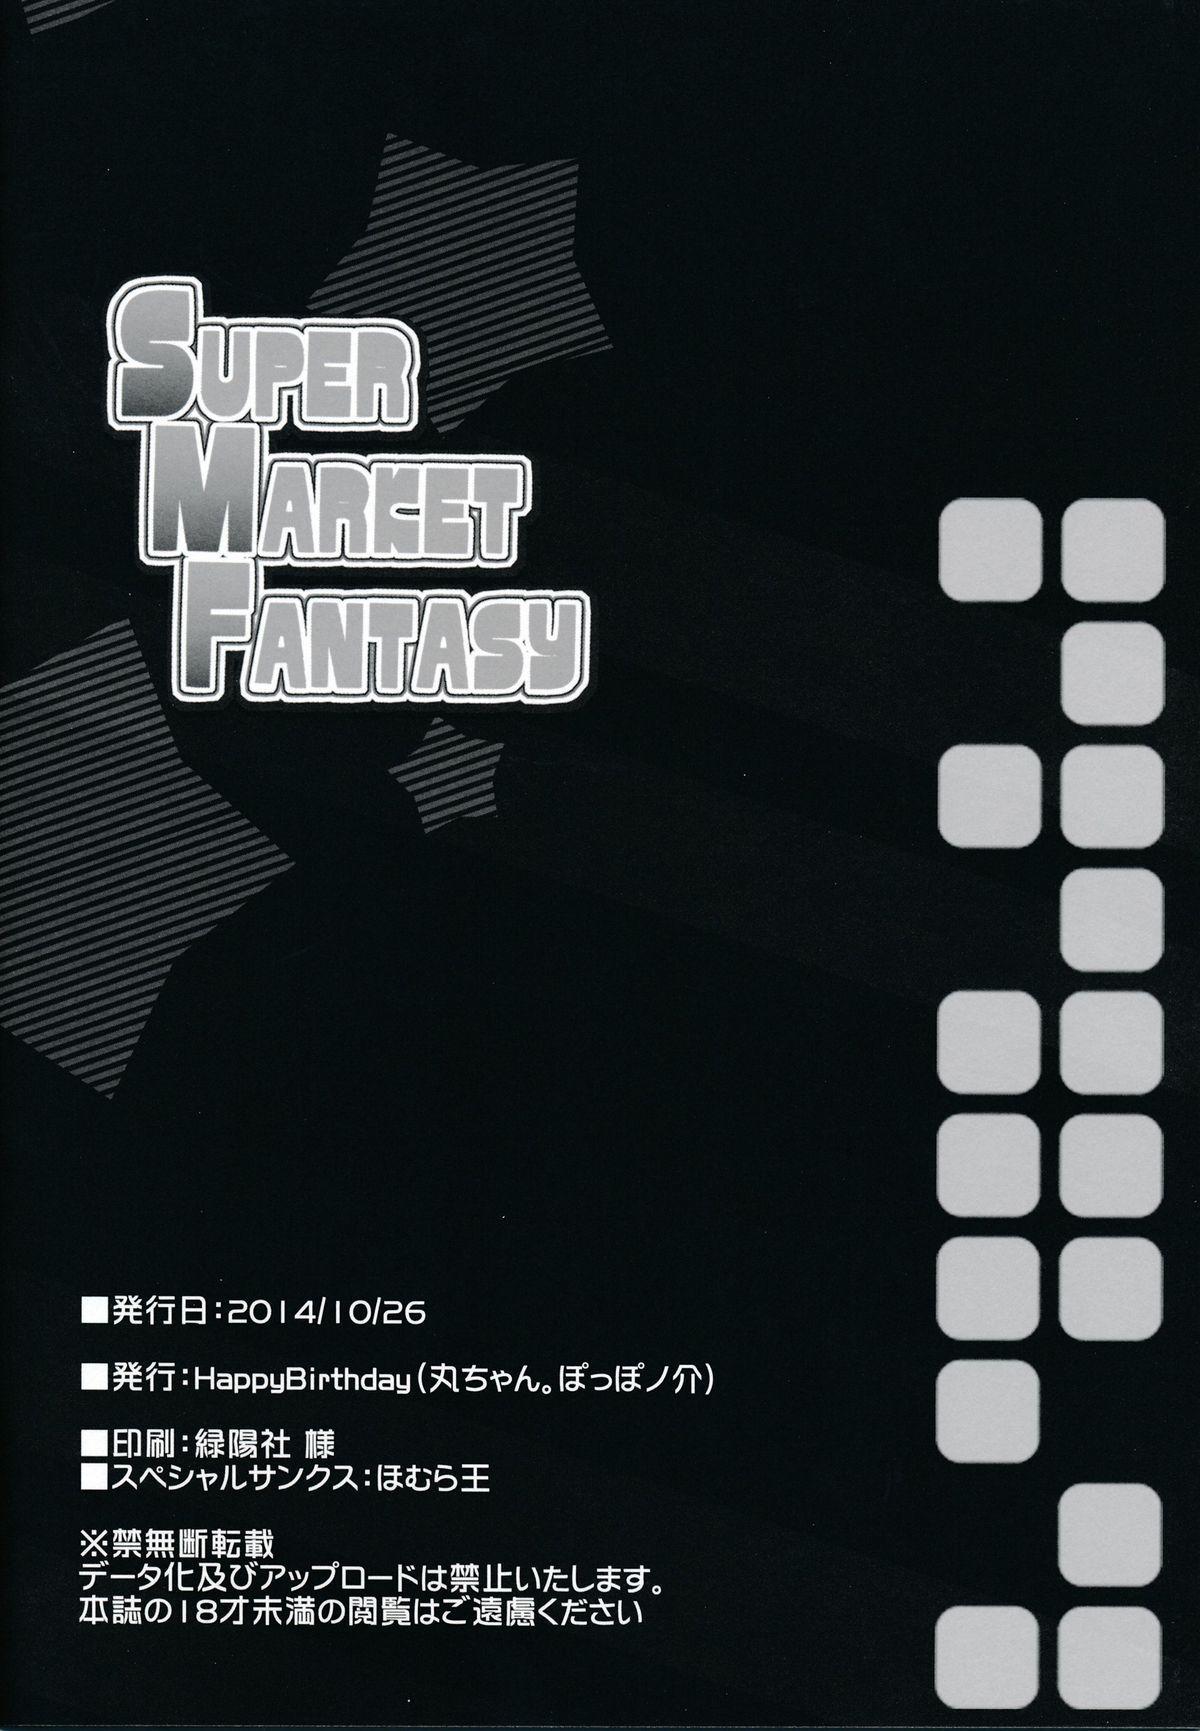 Super Market Fantasy 12